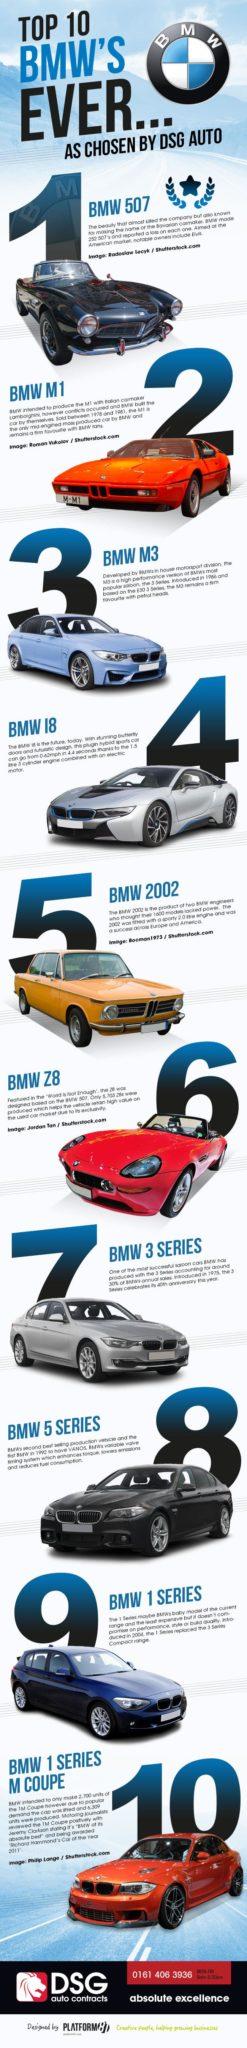 BMW-top-10-cars